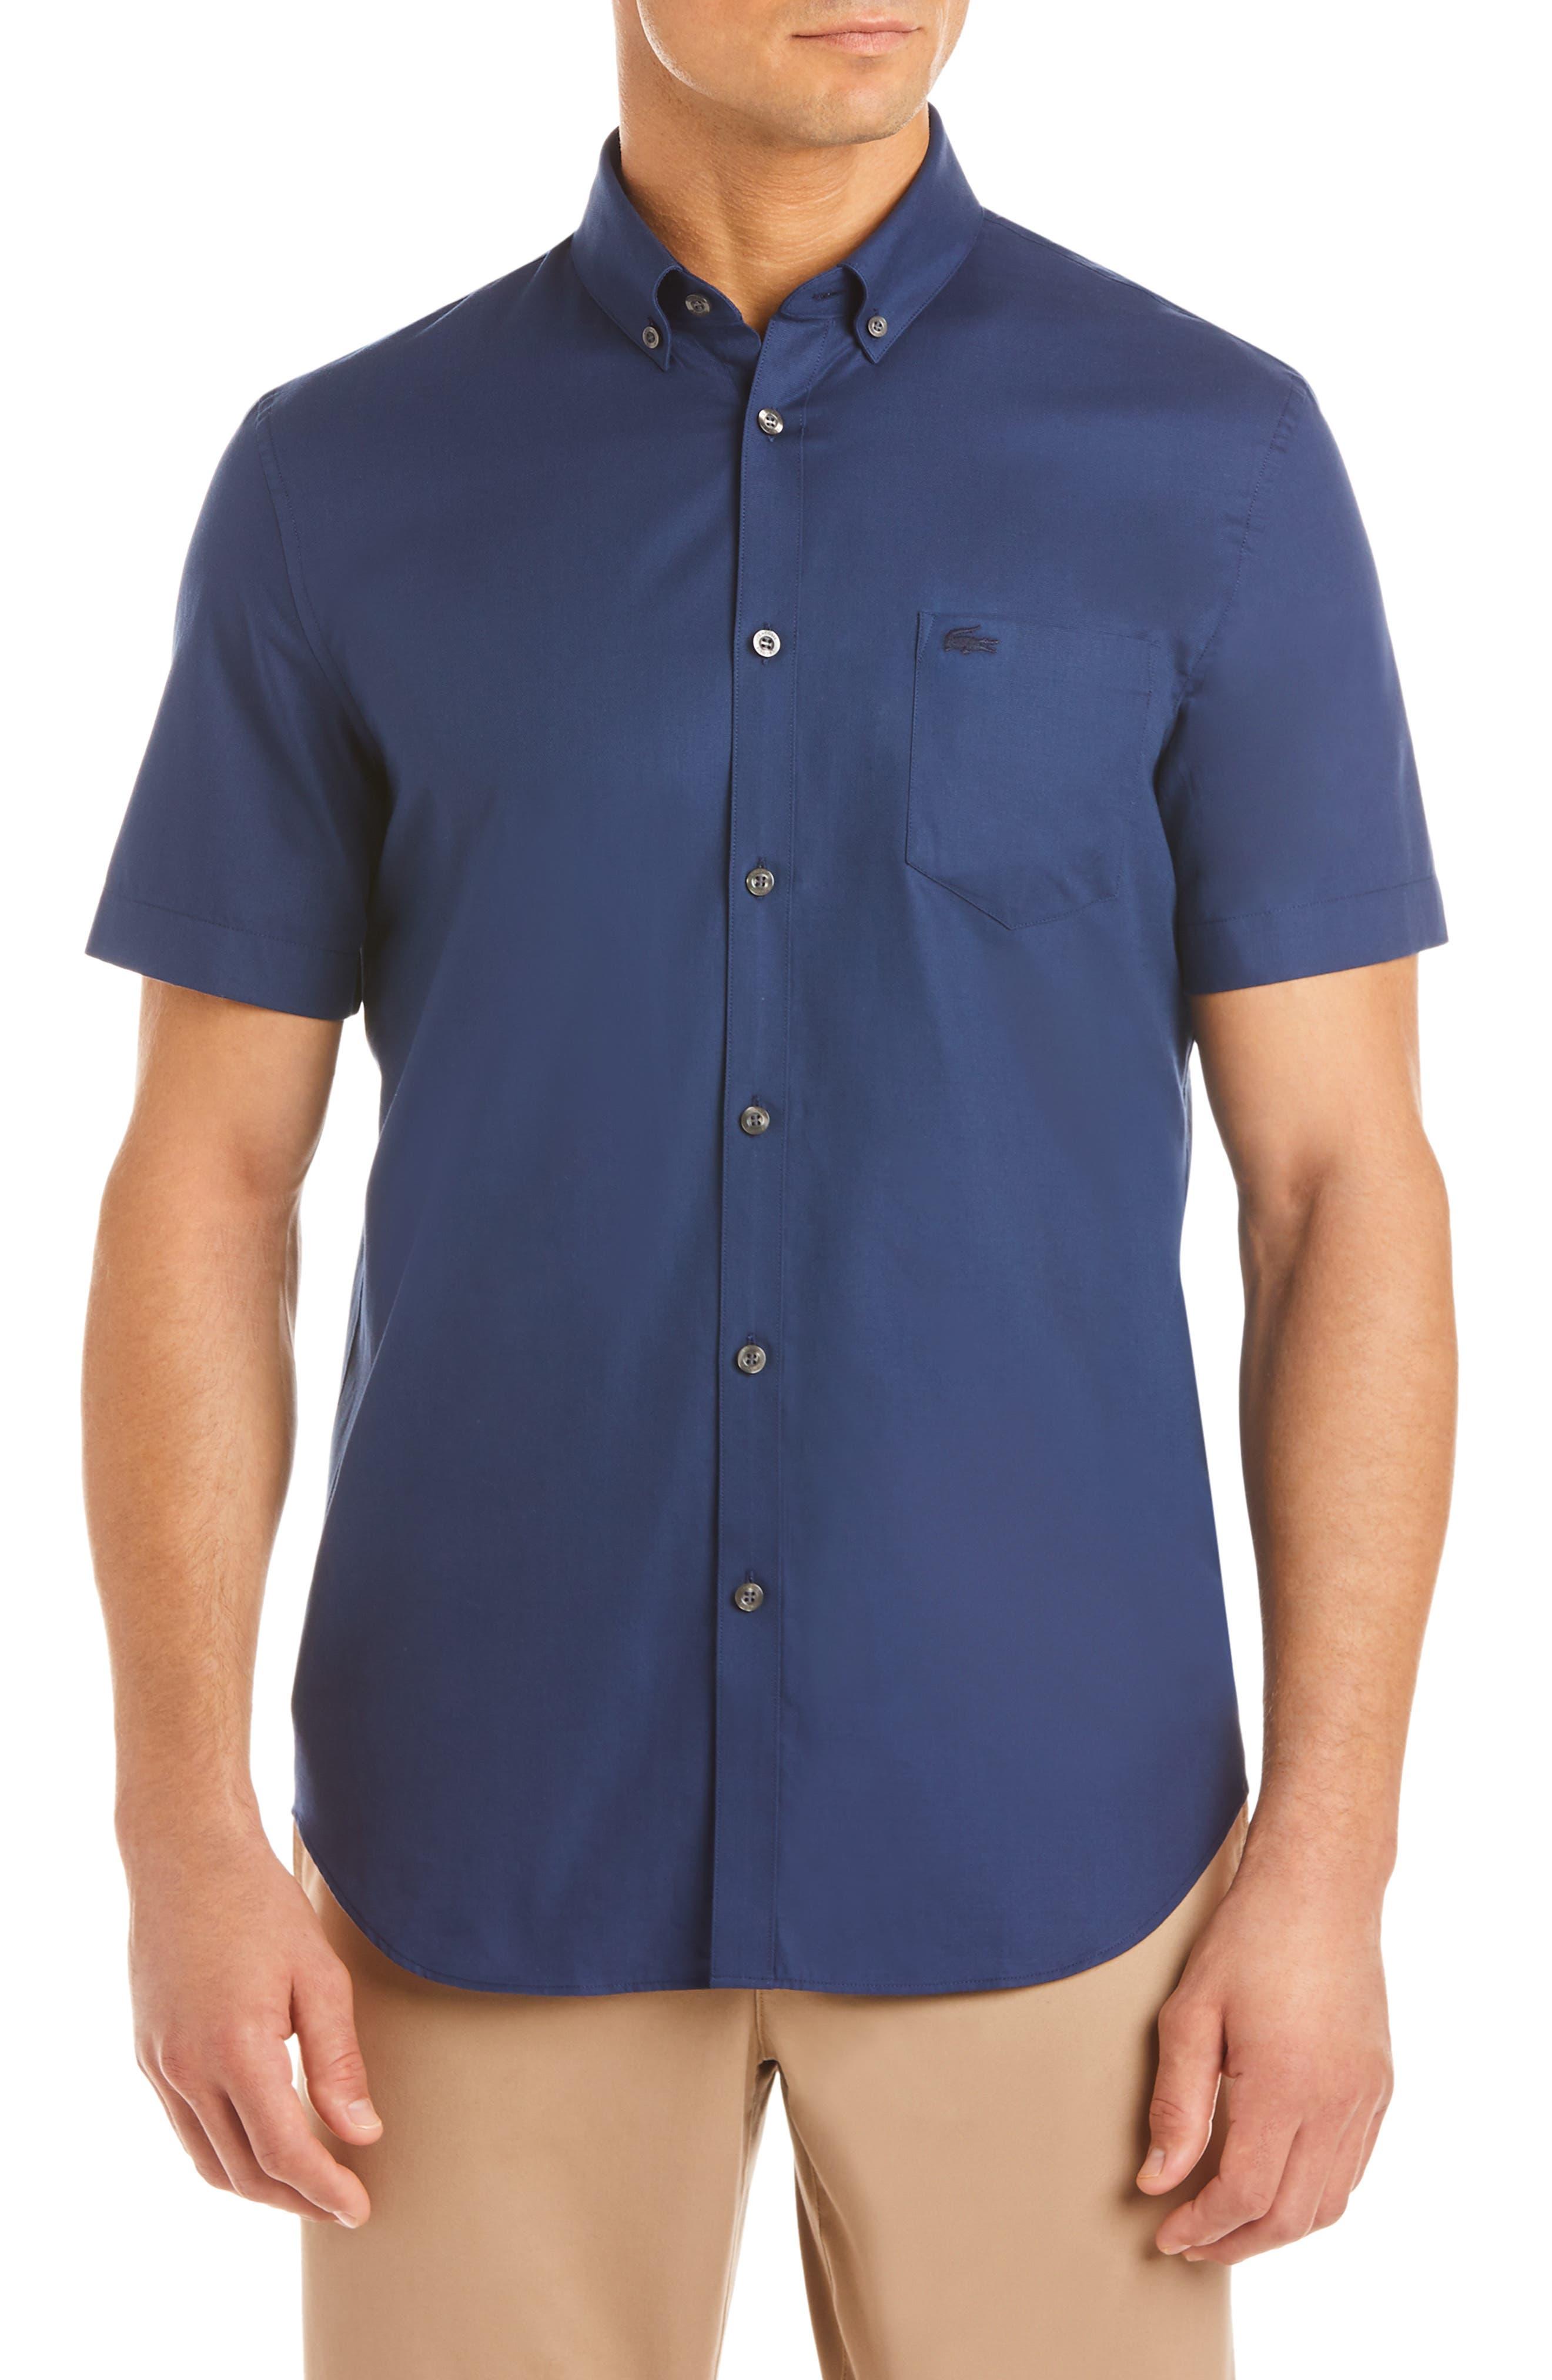 Regular Fit Piqué Sport Shirt, Main, color, PHOENIX BLUE/ LAGOON